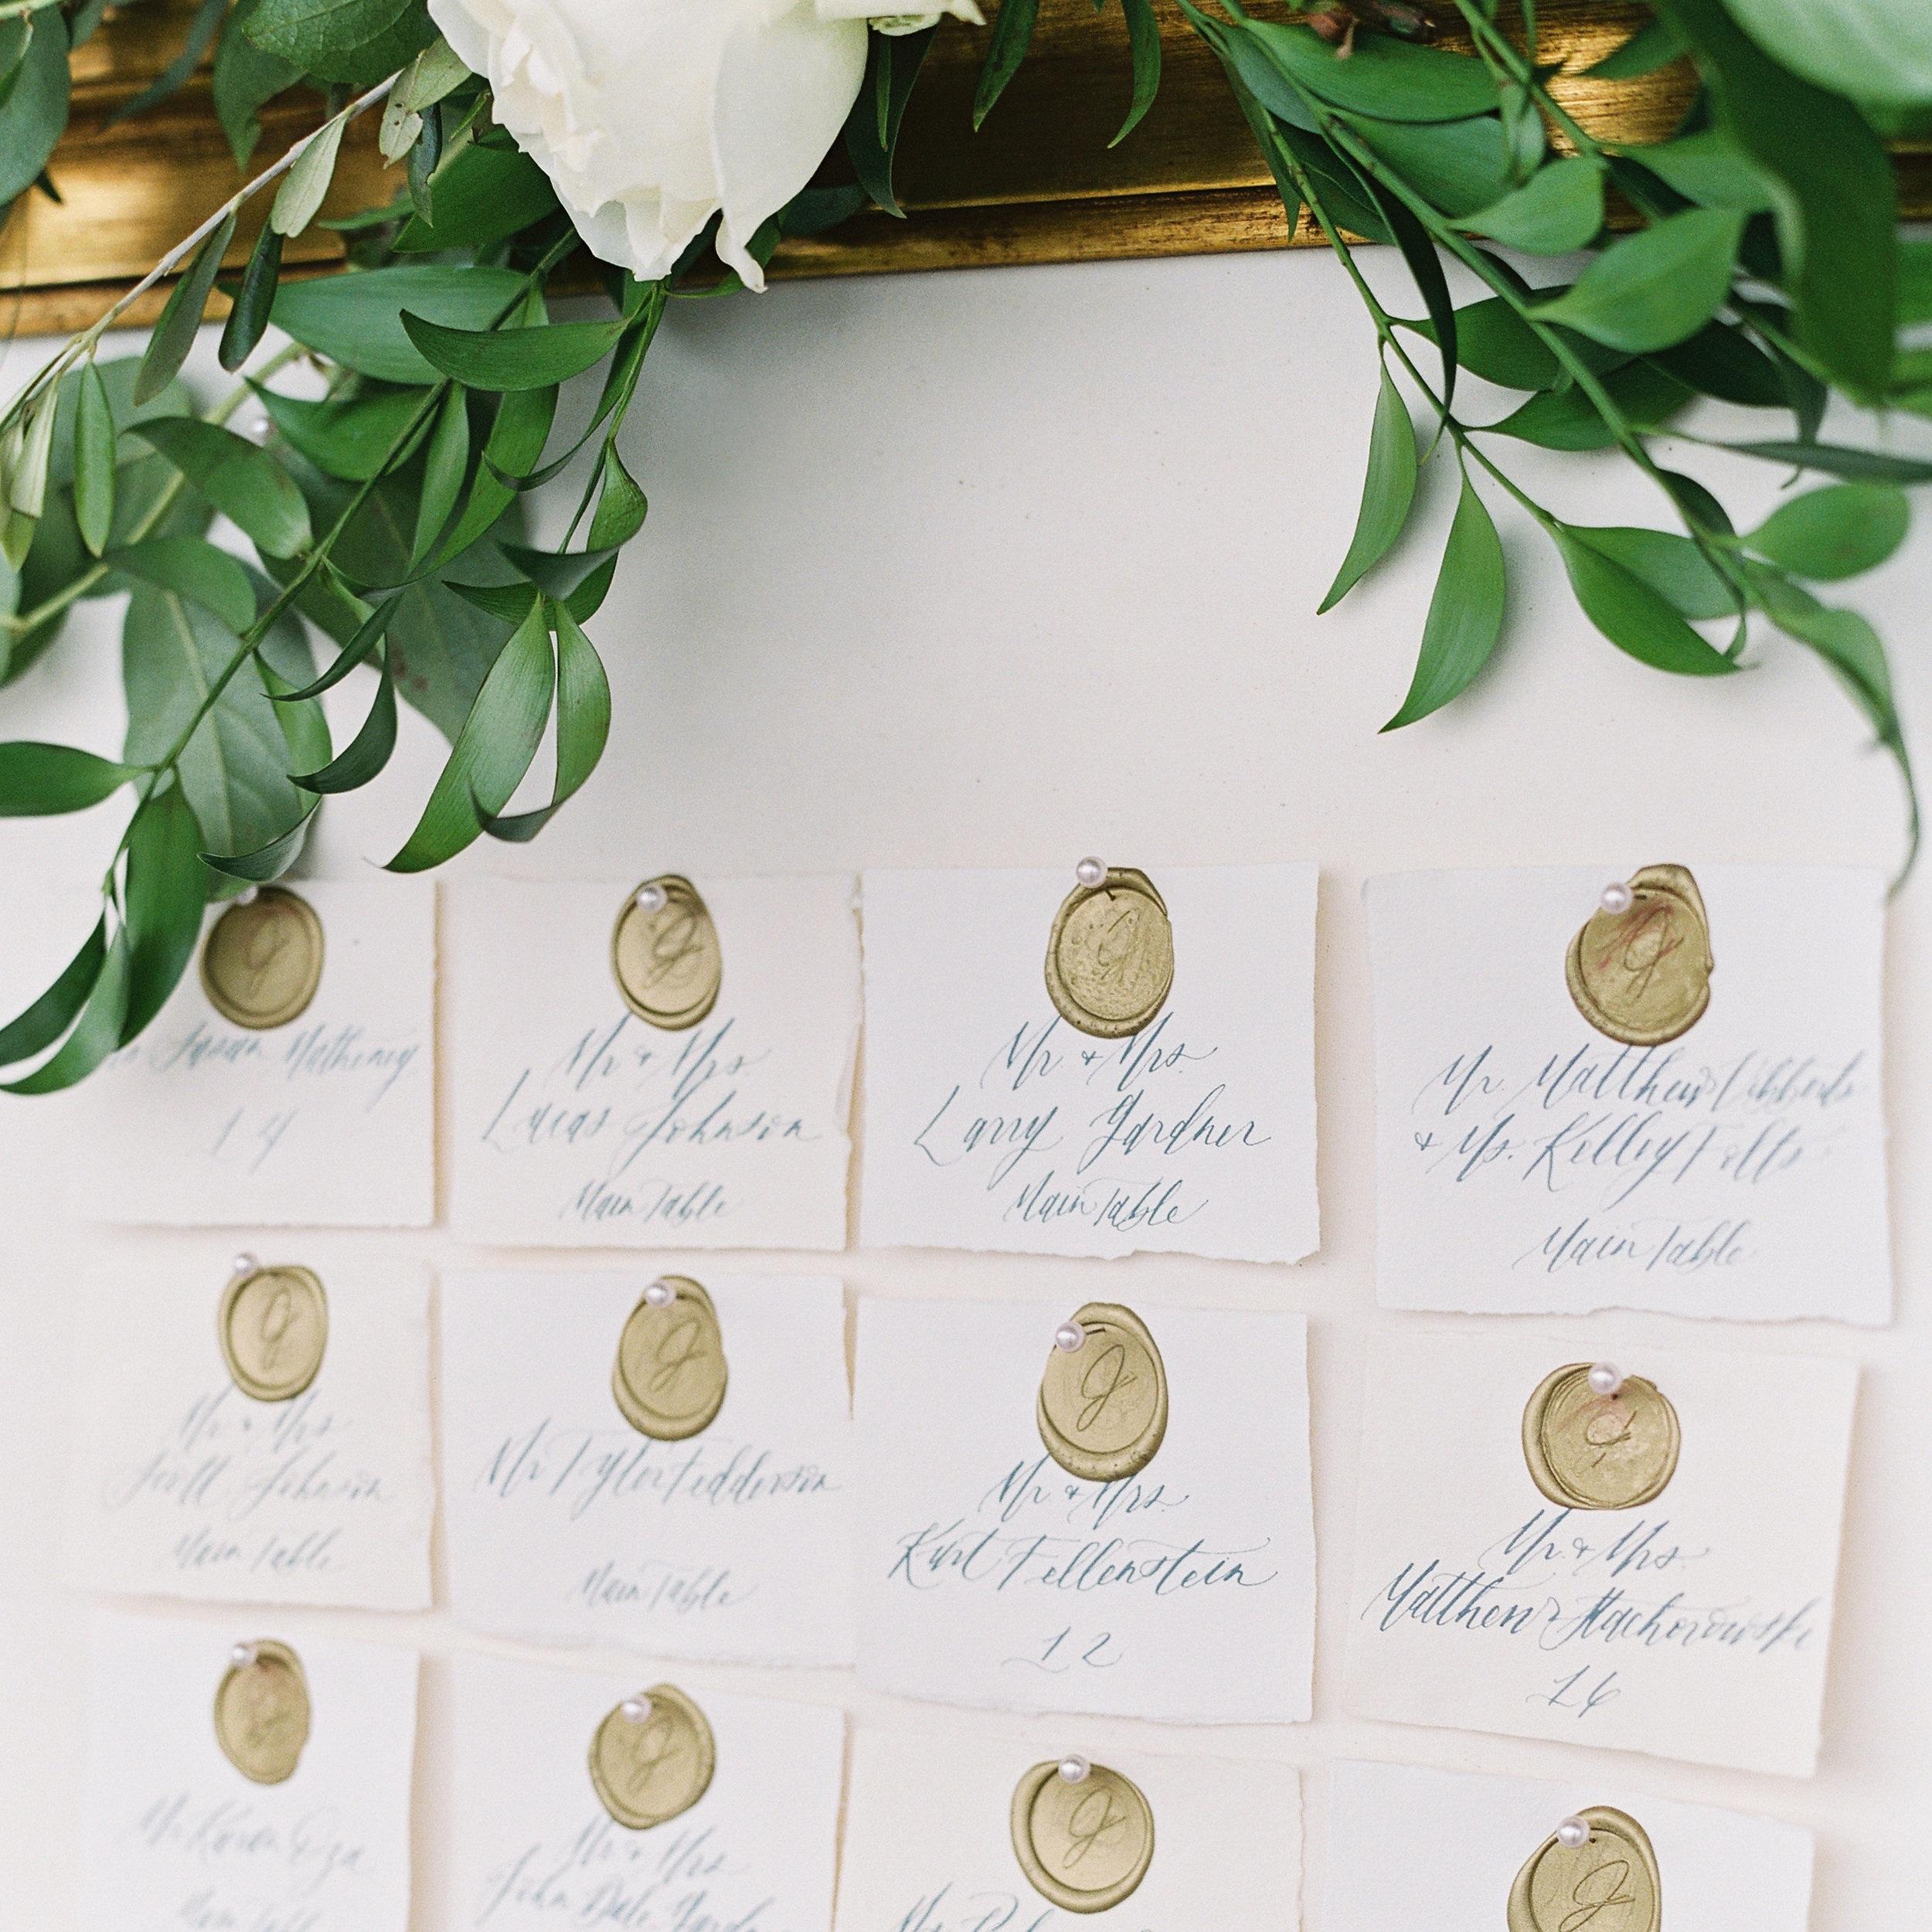 Wax Seal Escort Cards | Shotgunning for Love, Image by Lauren Fair